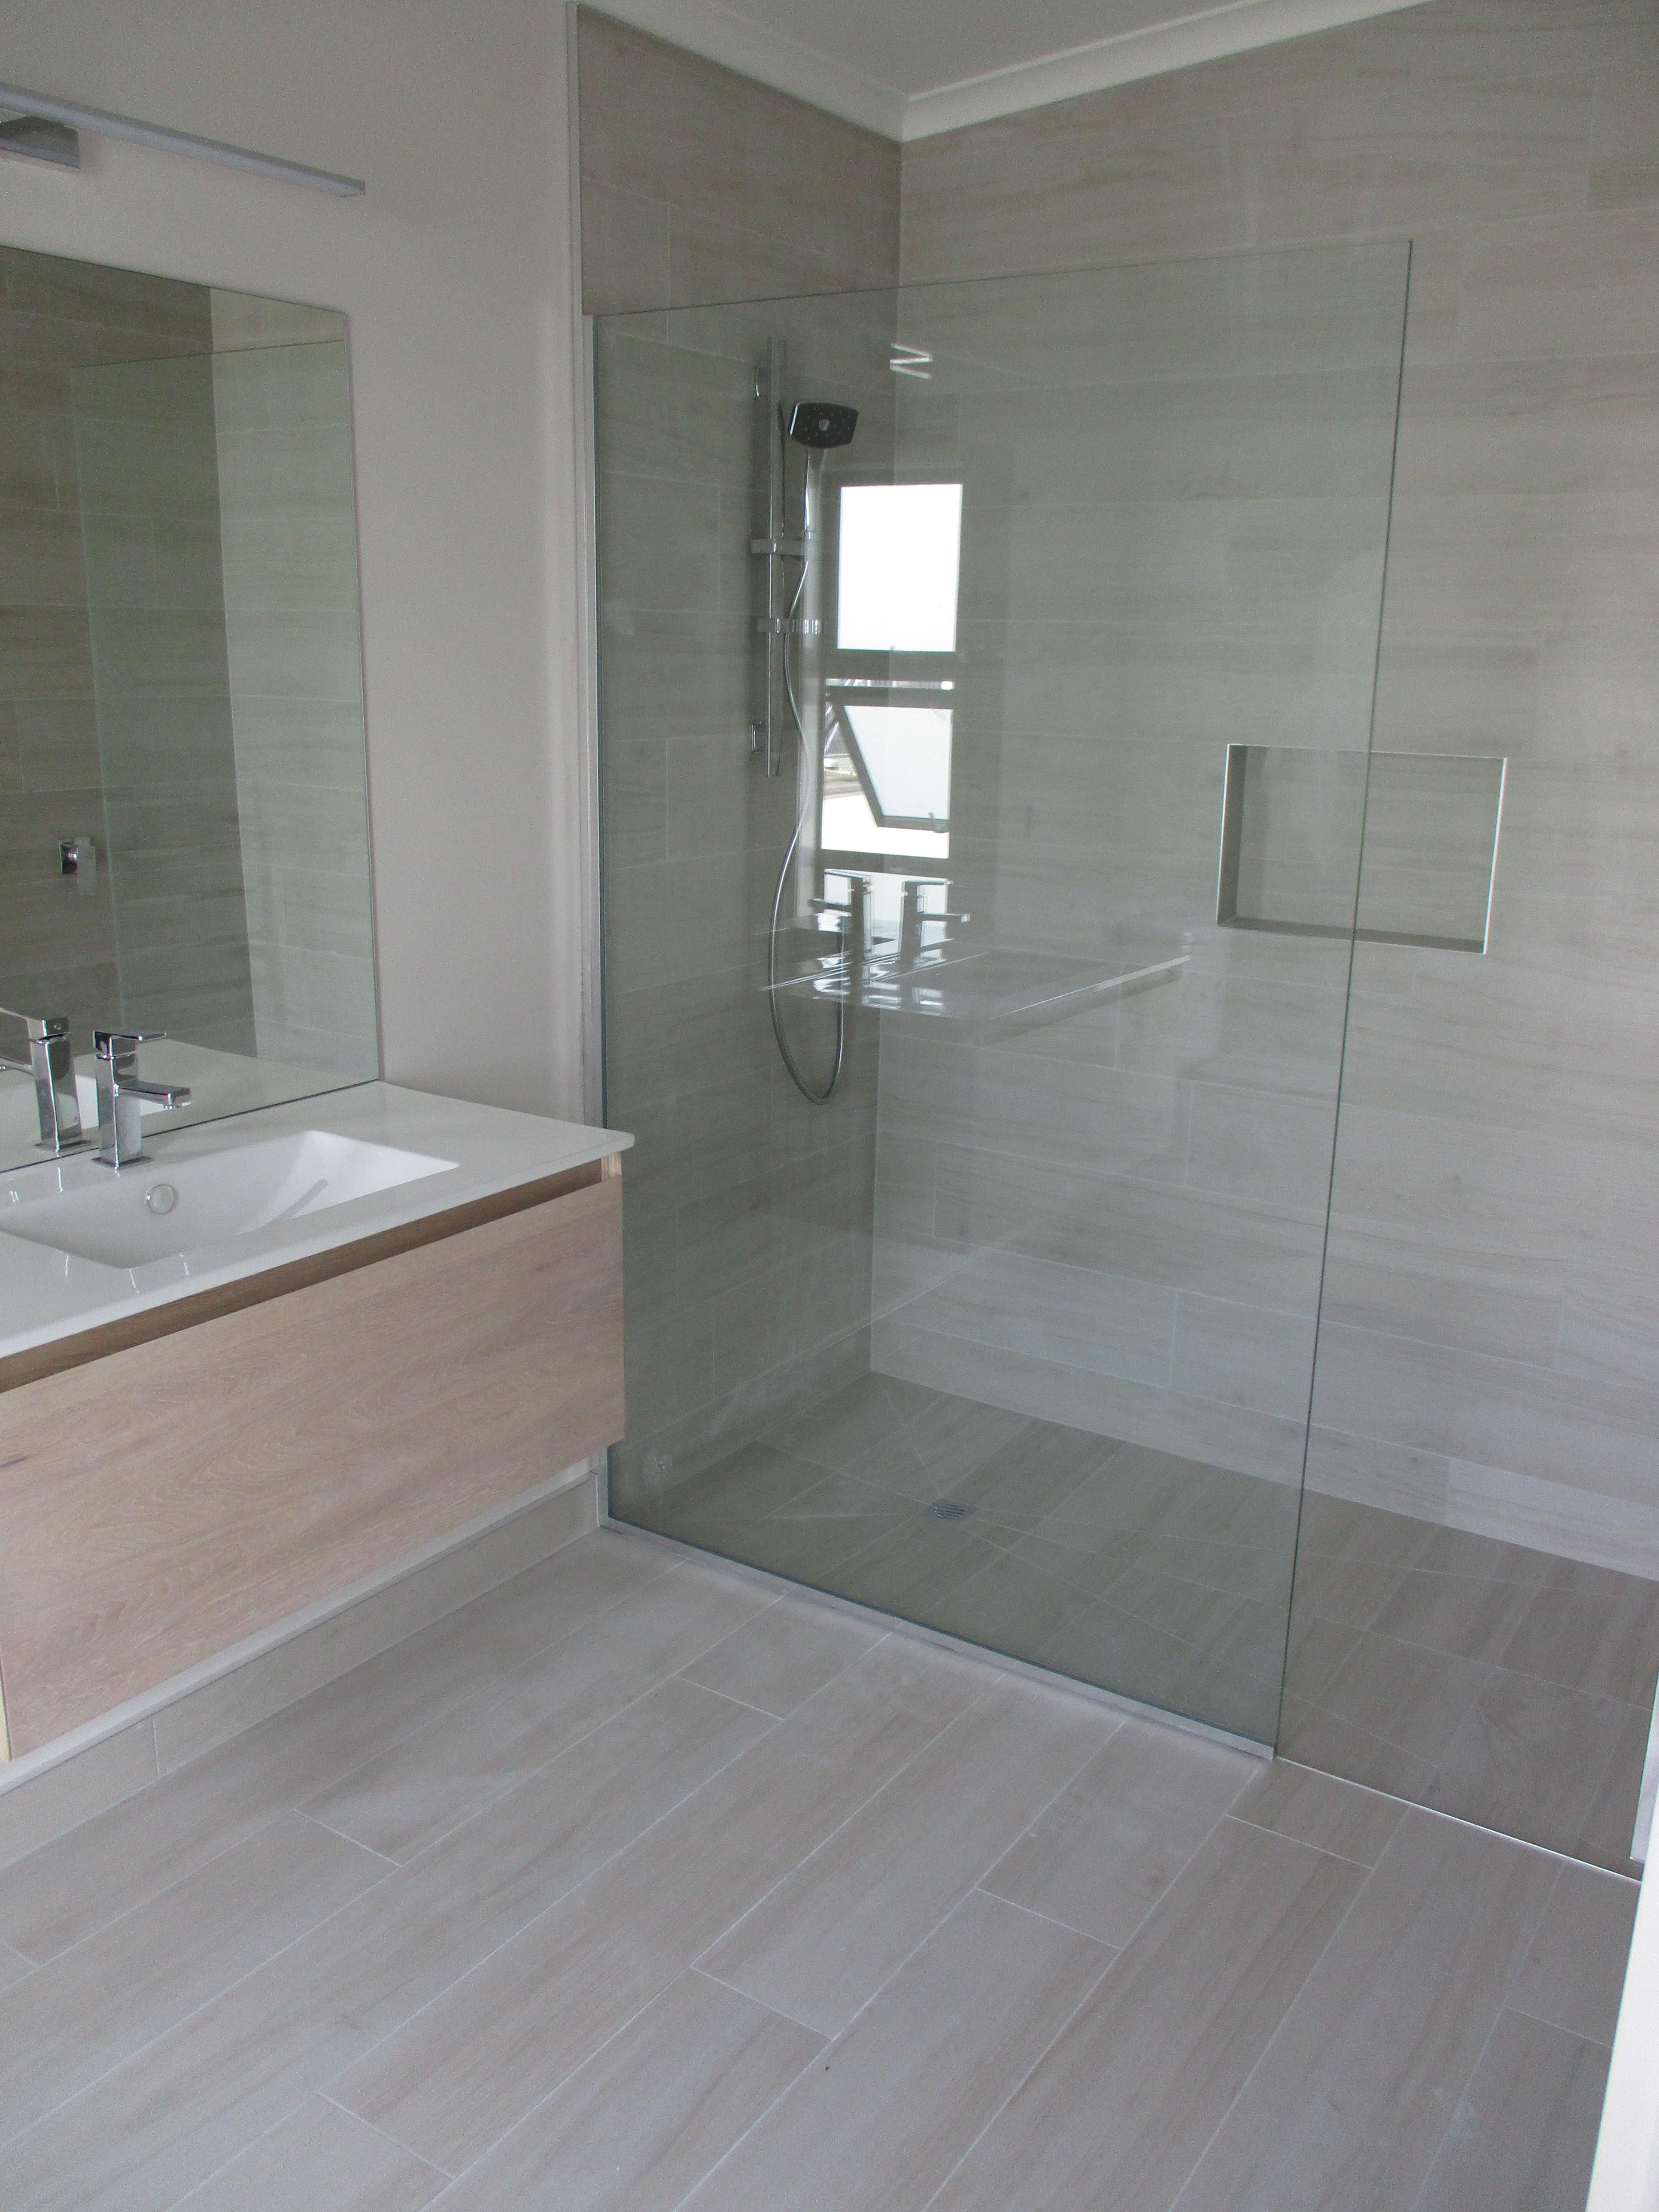 Timber look floor to ceiling bathroom Tile used Drift